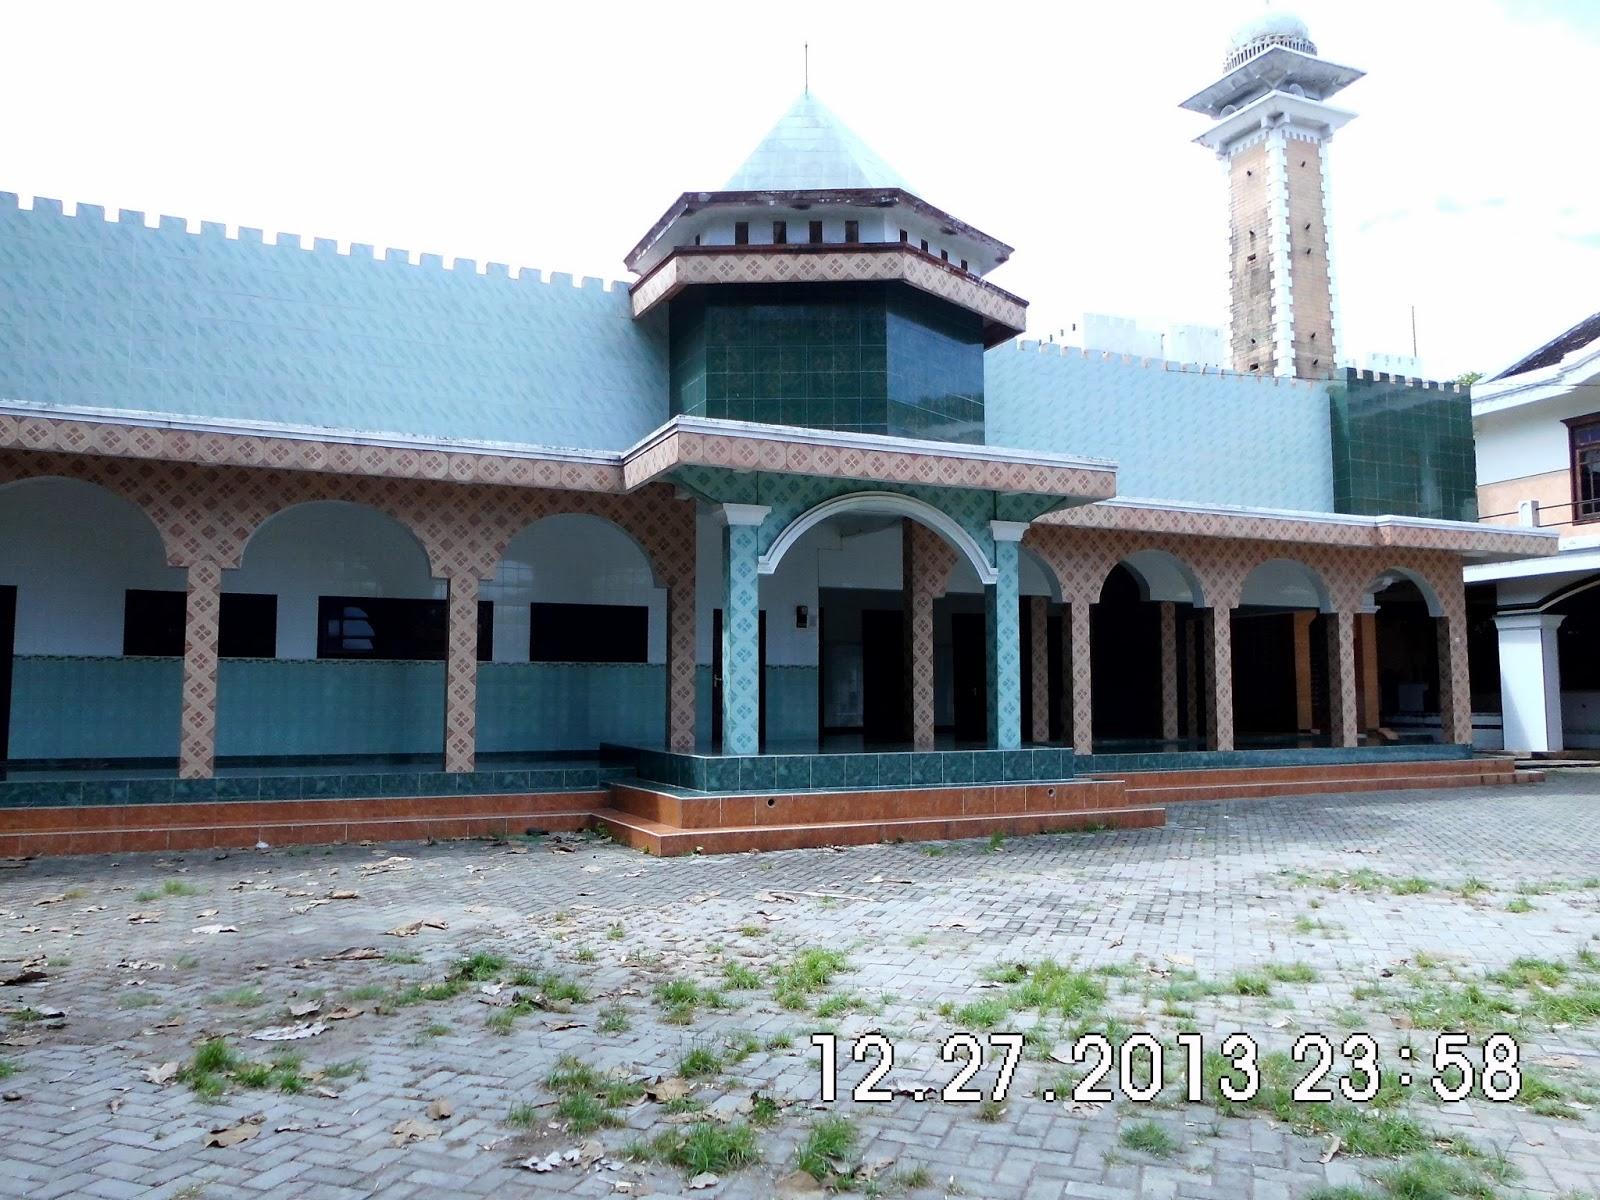 Hadi Net Berziarah Makam Soleh Nganjuk Masjid Kemaduh Baron Kanjeng